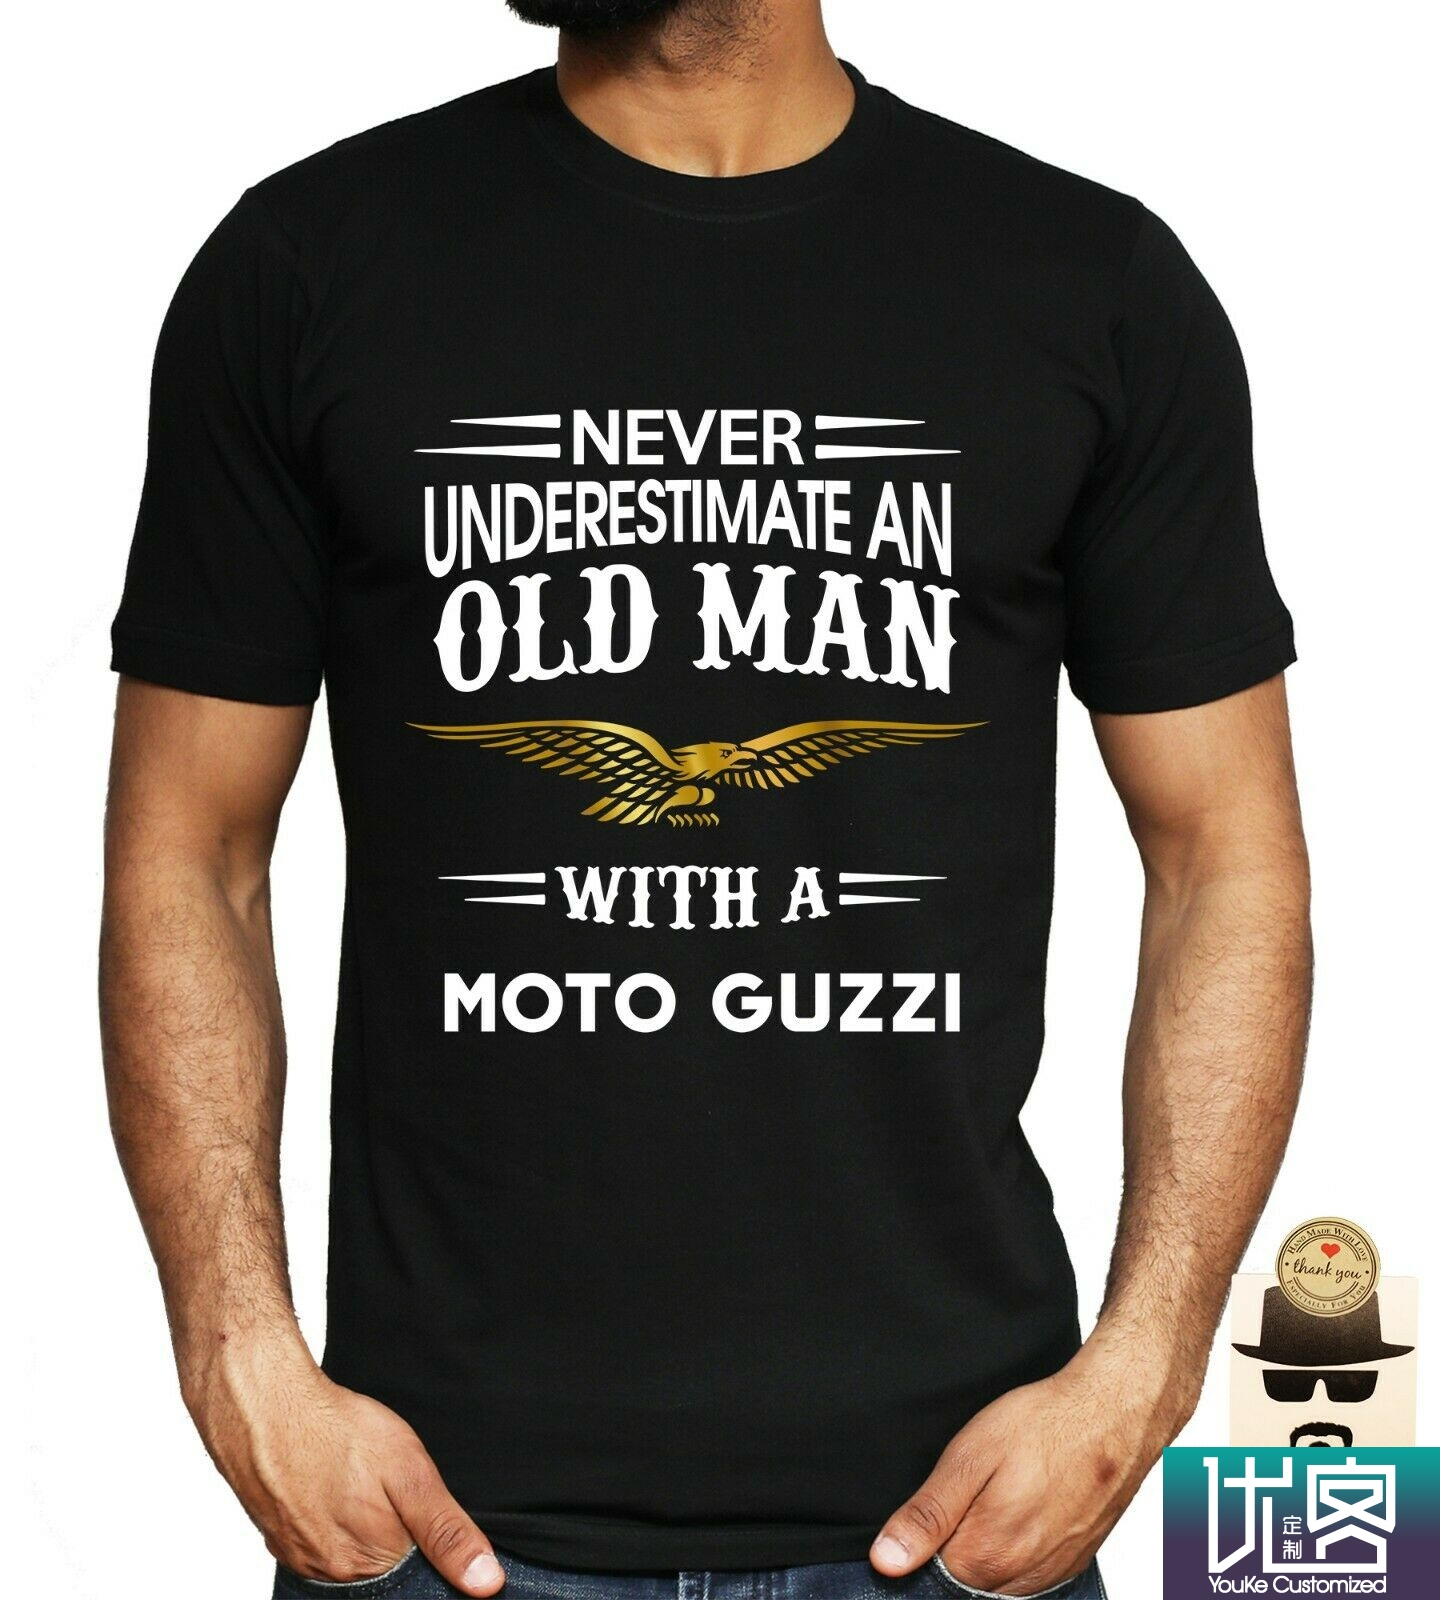 Never Underestimate Old Man With A Moto Guzzi,Mitsubishi,Mini,Skynet,Suzuki,Tesla Car Amazing Men's Short Sleeve T-Shirt